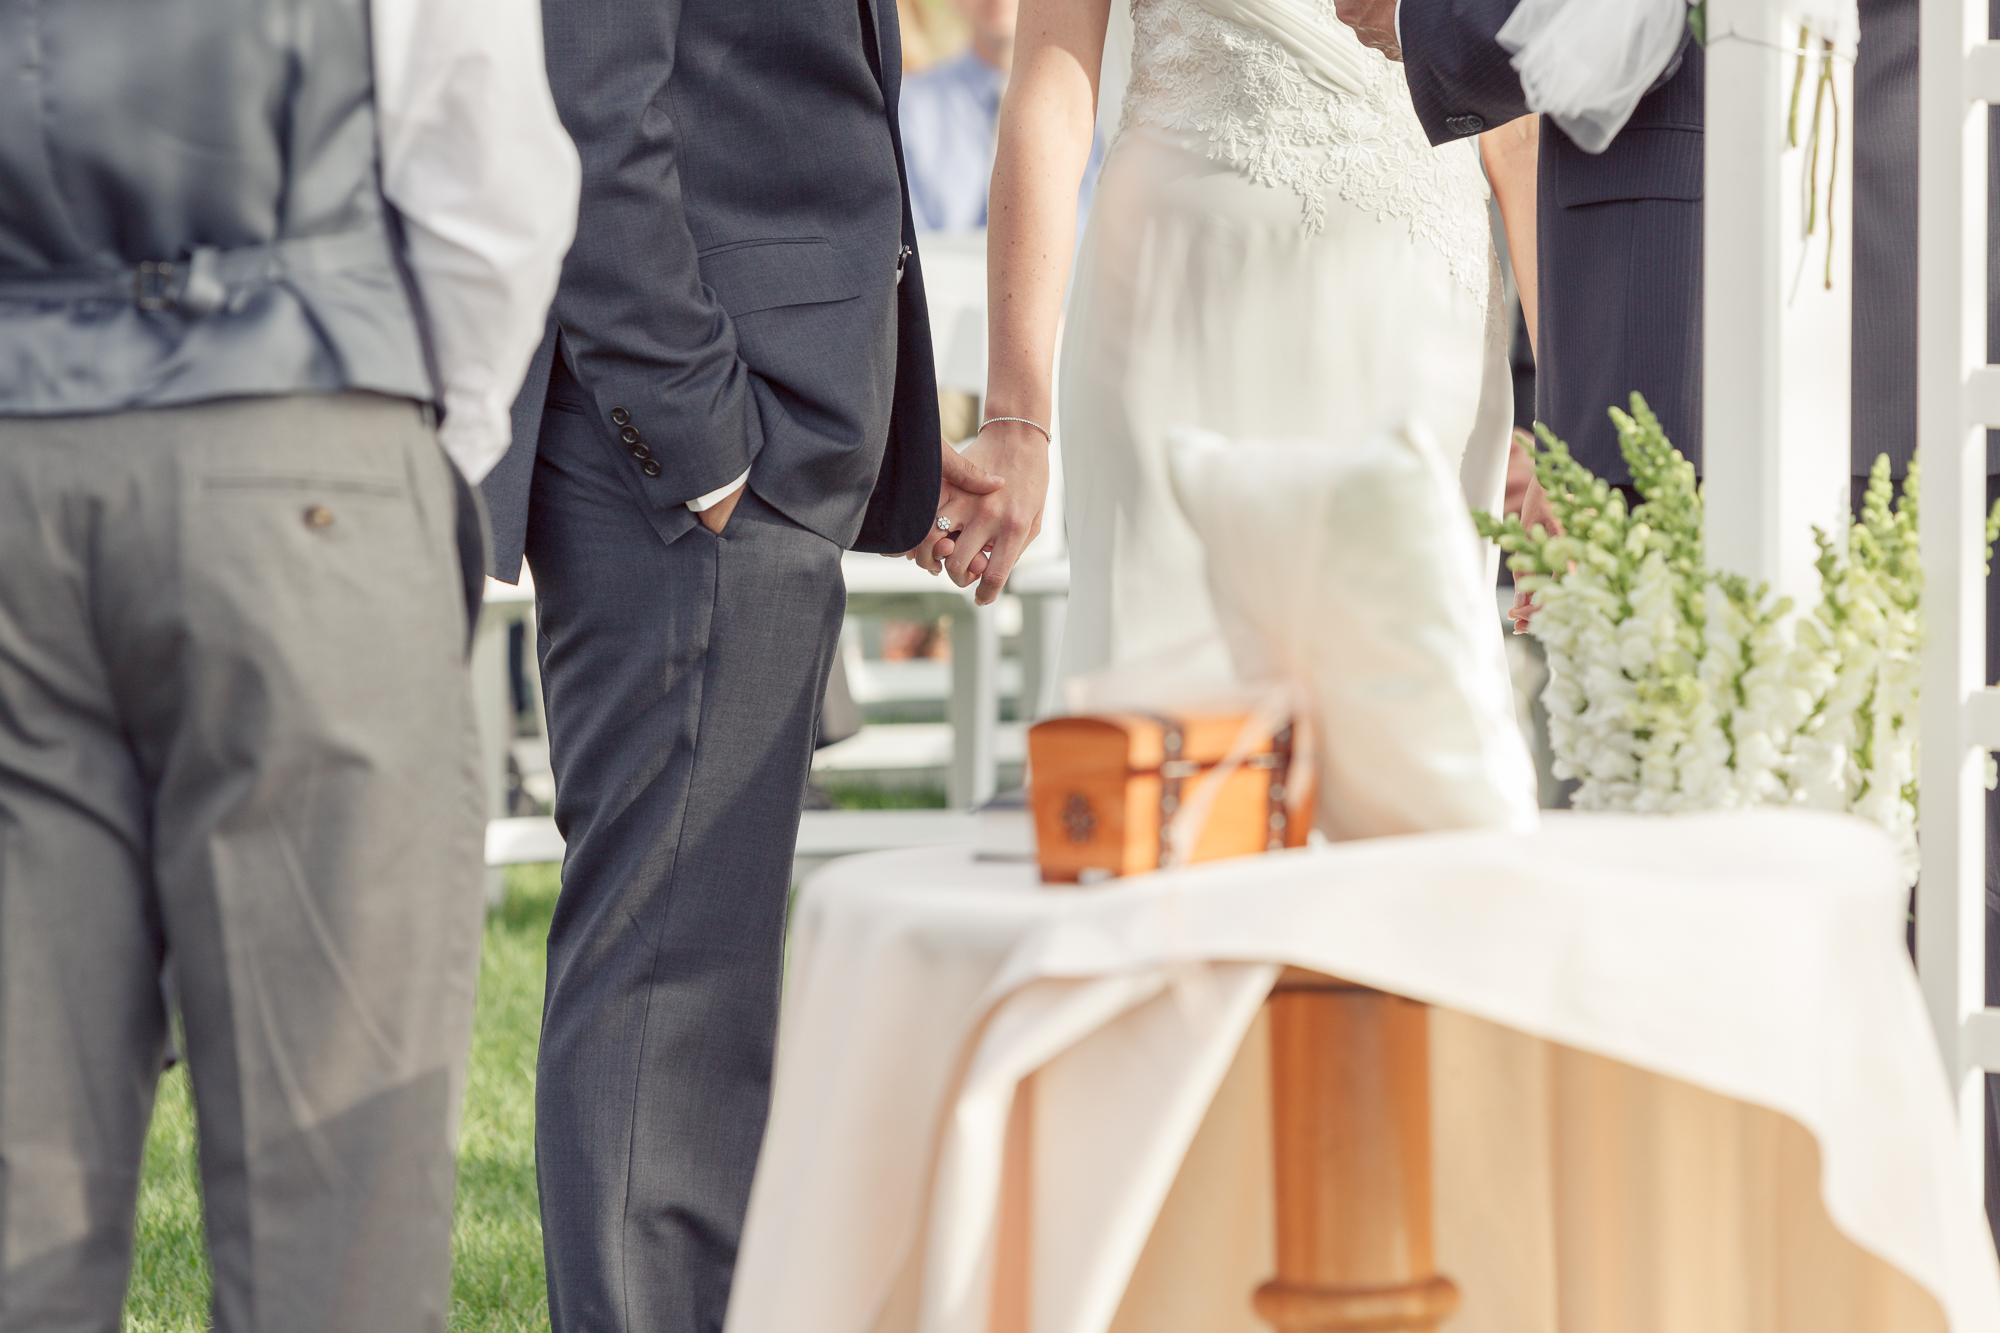 scranton-wedding-photography-zak-zavada-poconos--mattRachel-027.jpg